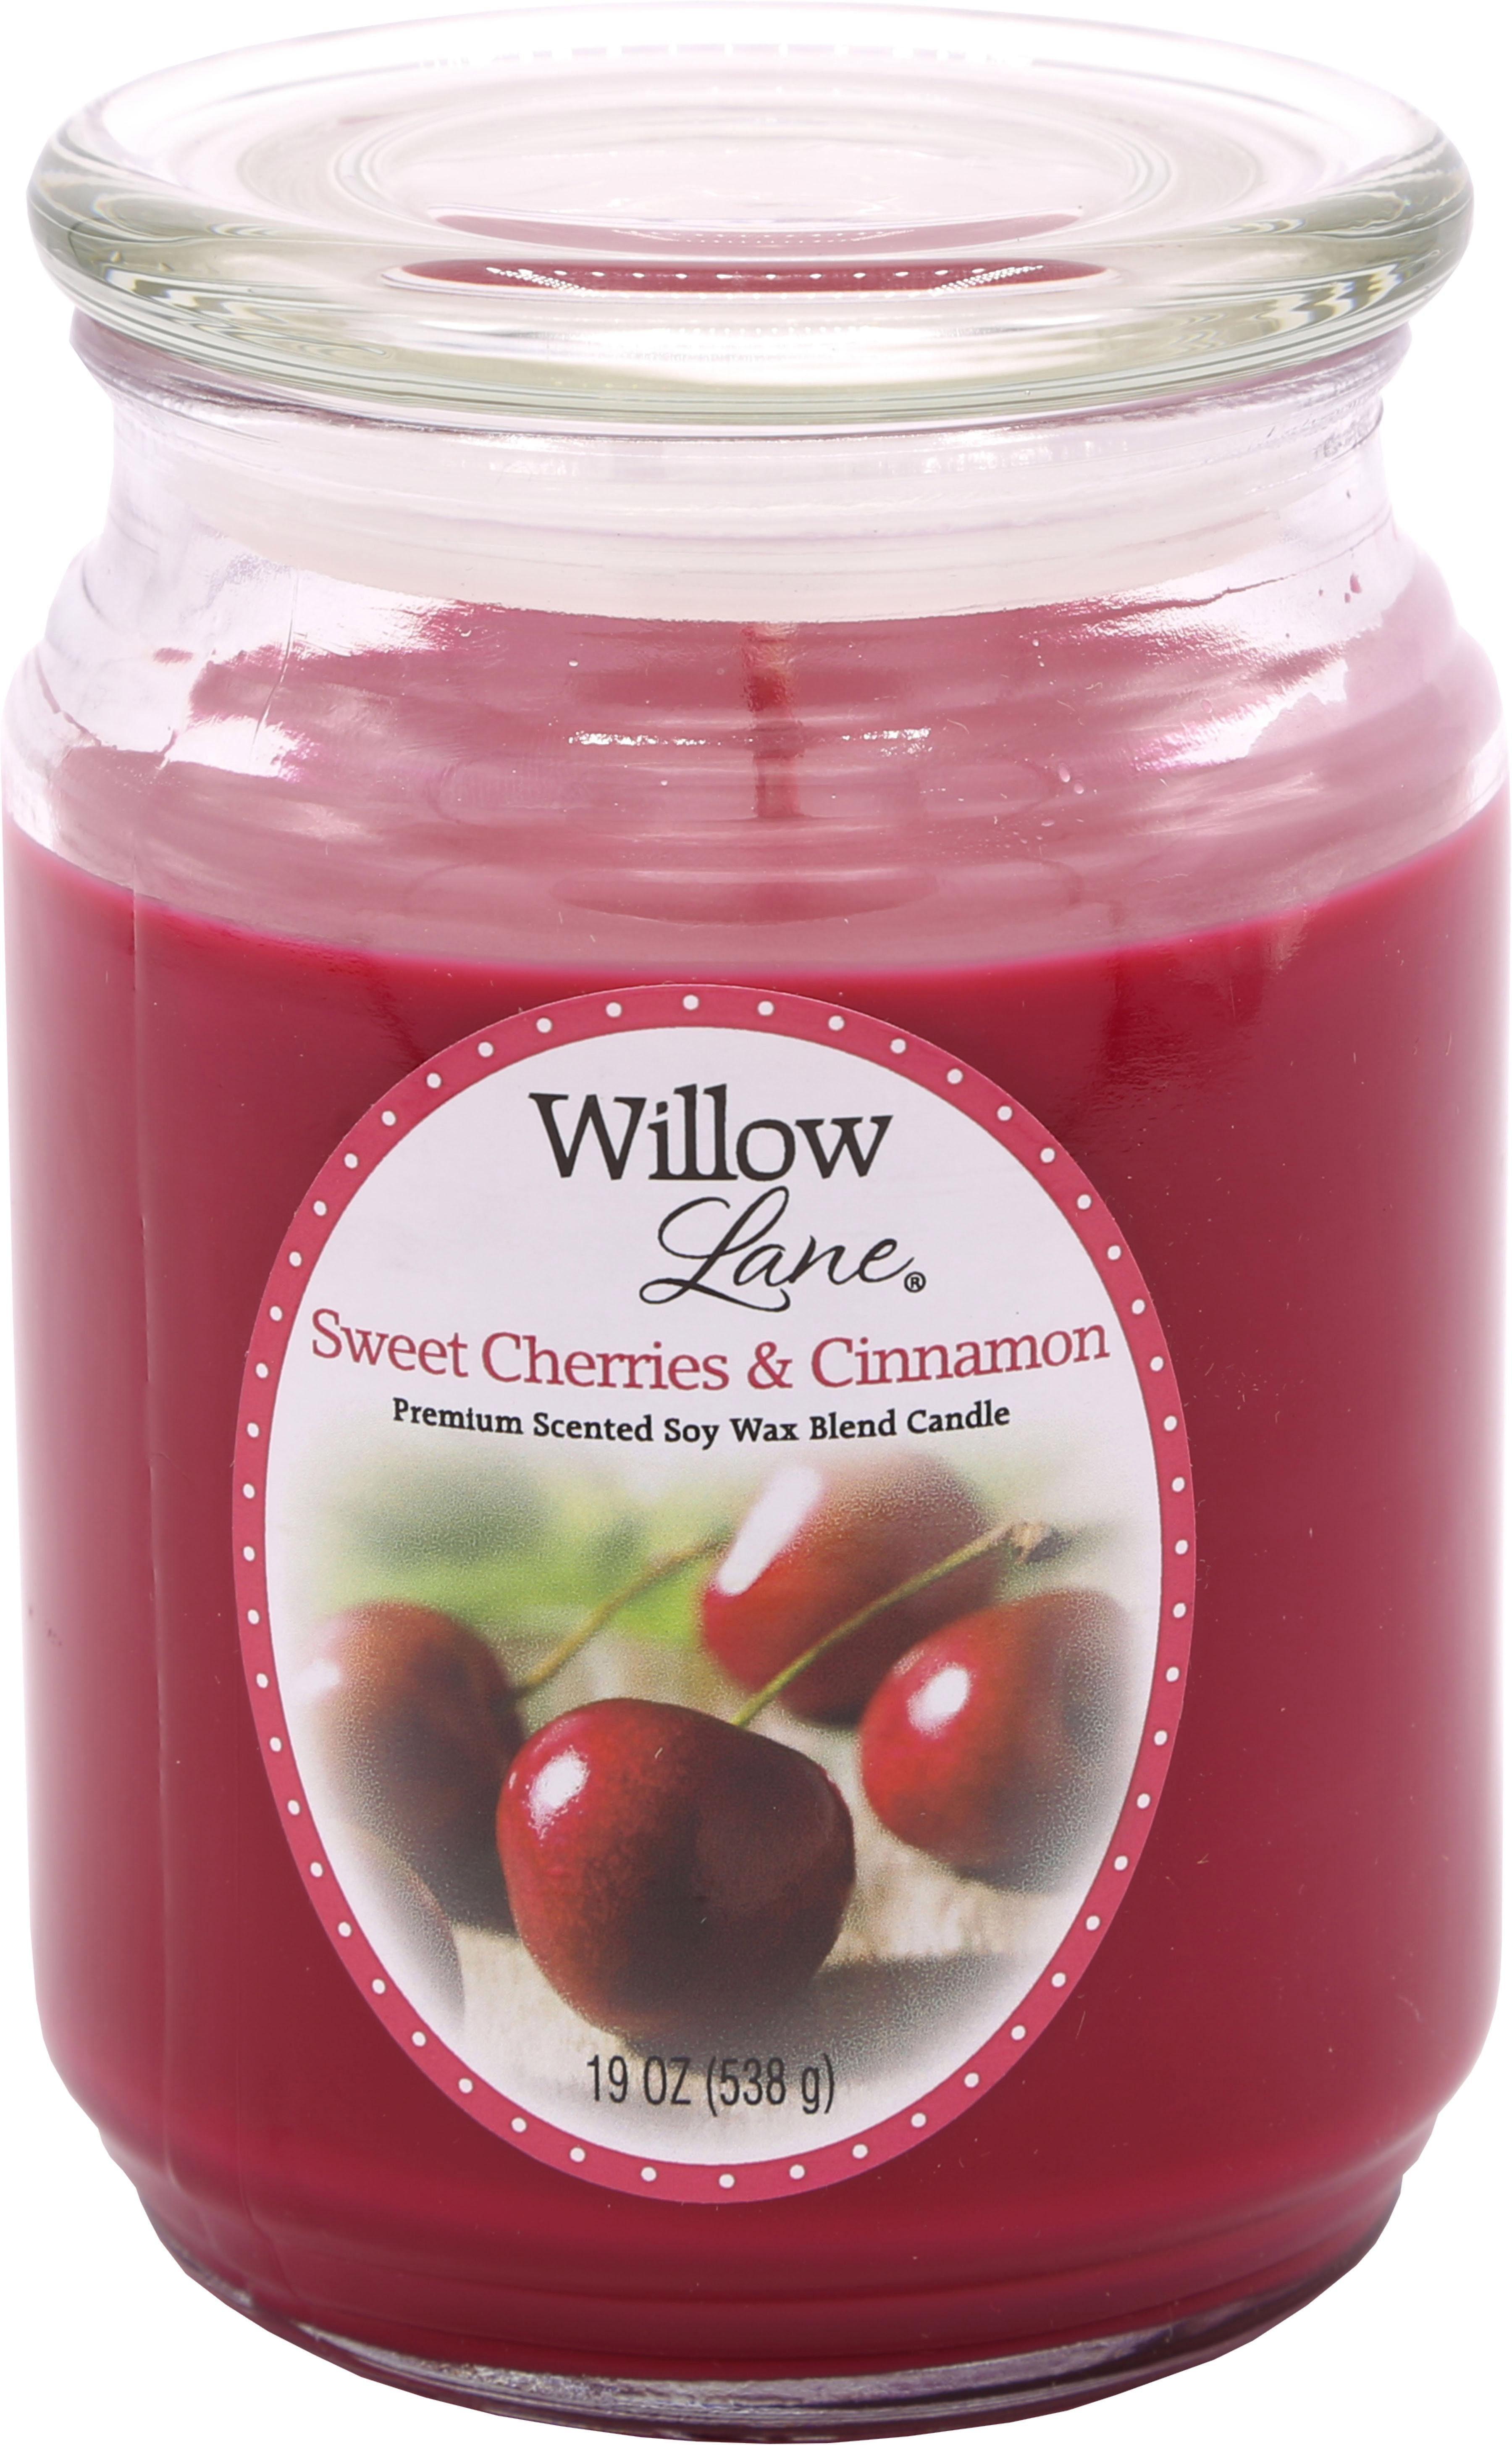 Candle-lite™ Duftkerze, 538 g, »Willow Lane - Sweet Cherries & Cinnamon«